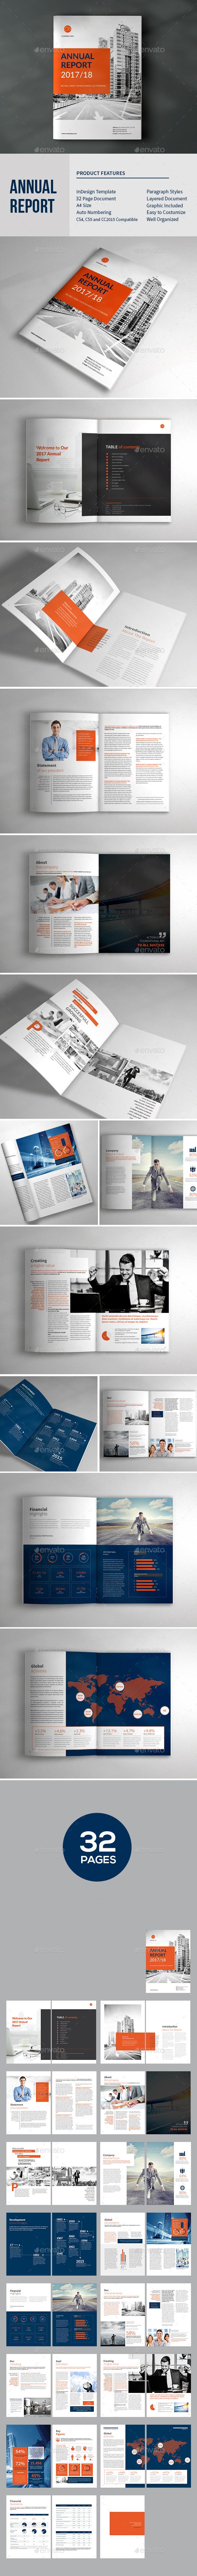 Annual Report Template Brochure - Brochures Print Templates